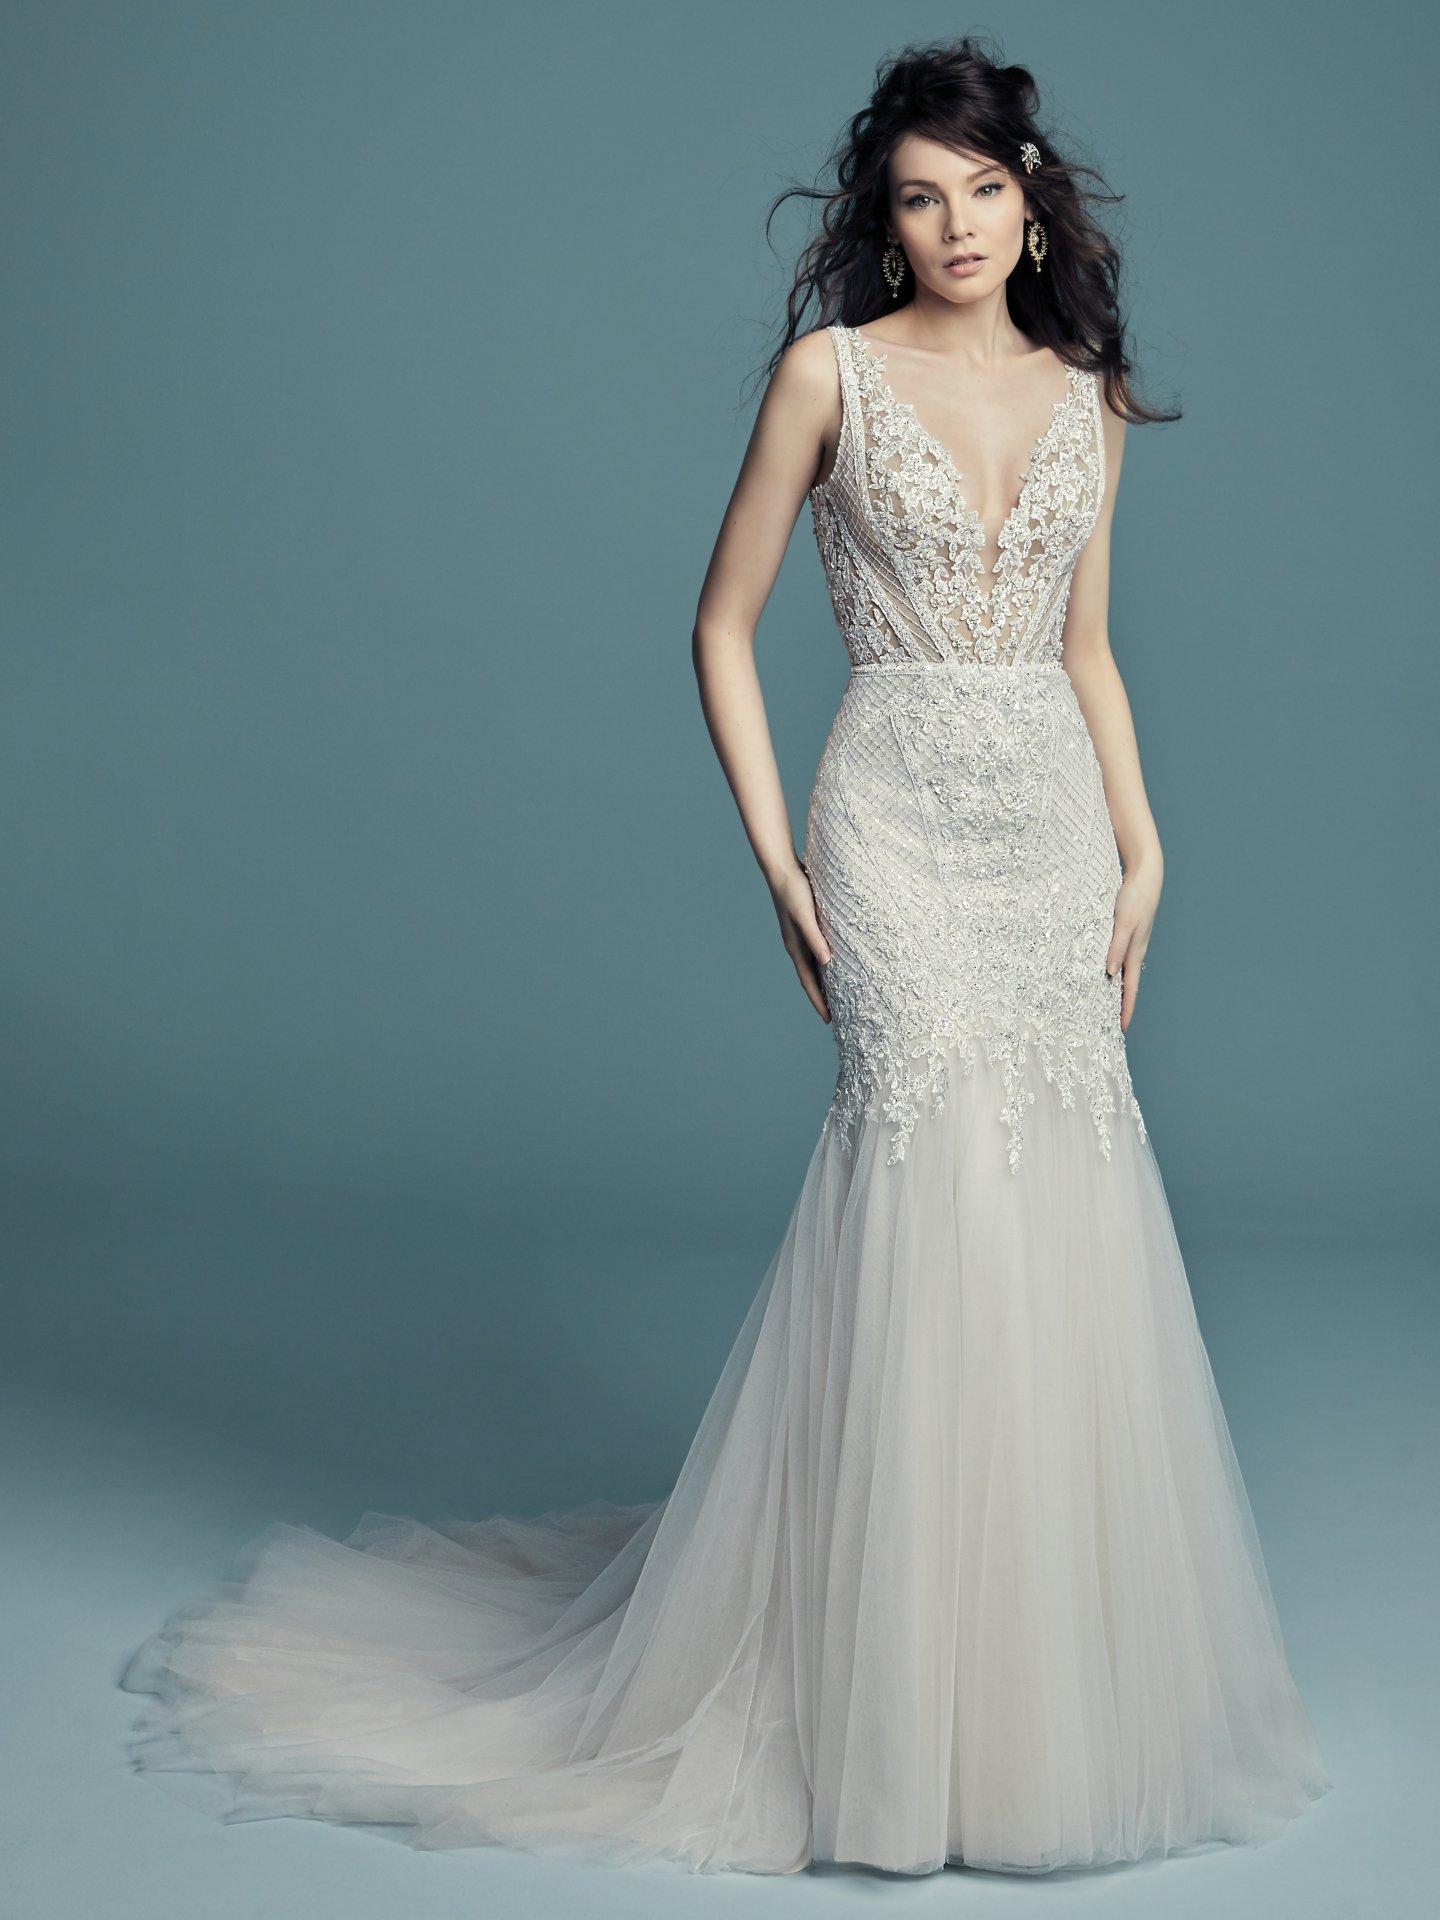 1940s Inspired Wedding Dresses Off 71 Buy